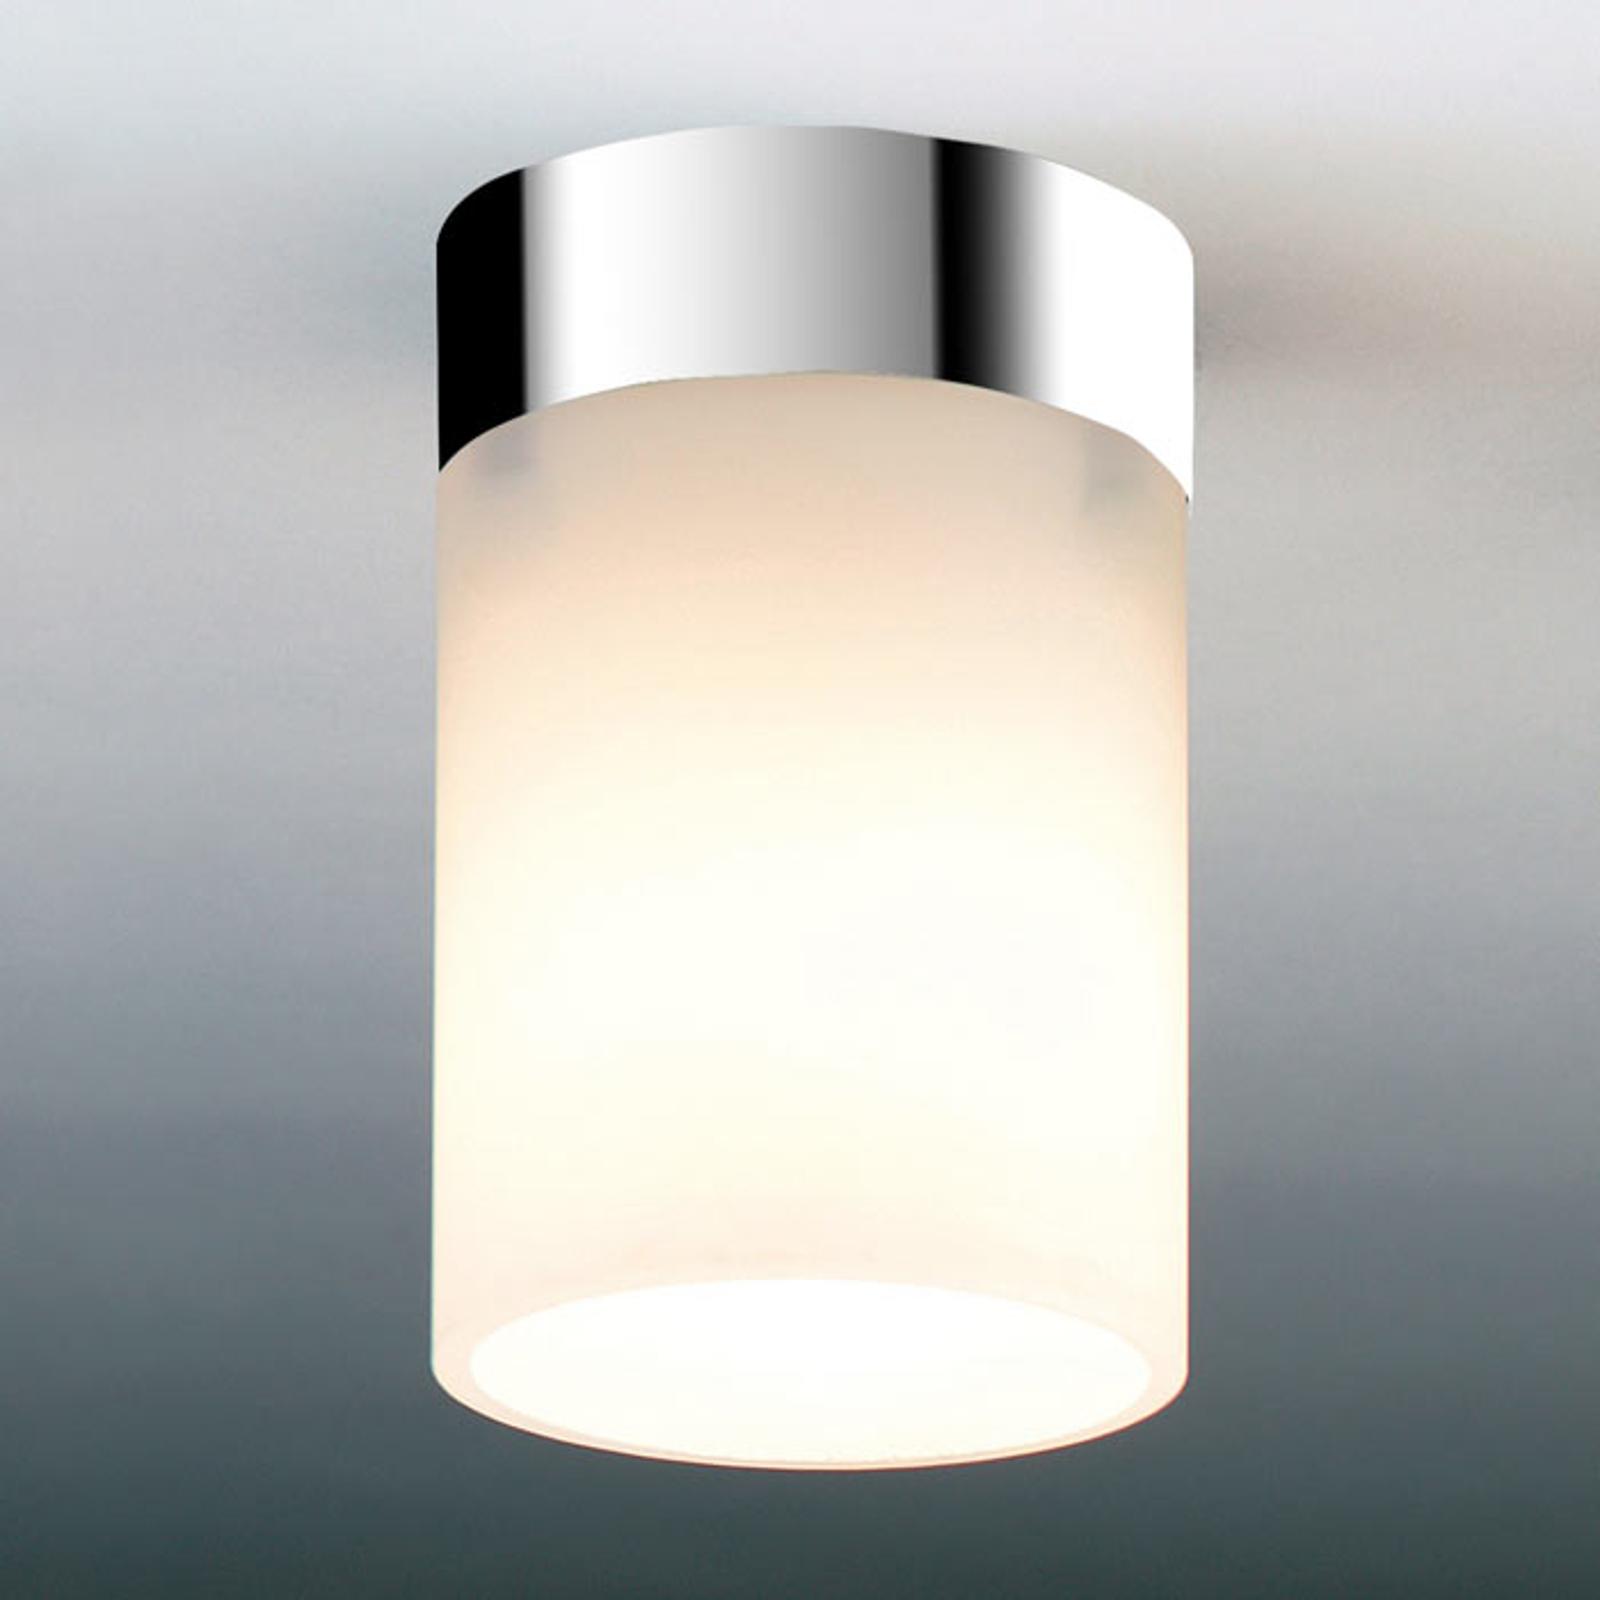 Subtelna lampa sufitowa DELA BOX SHORT, chrom